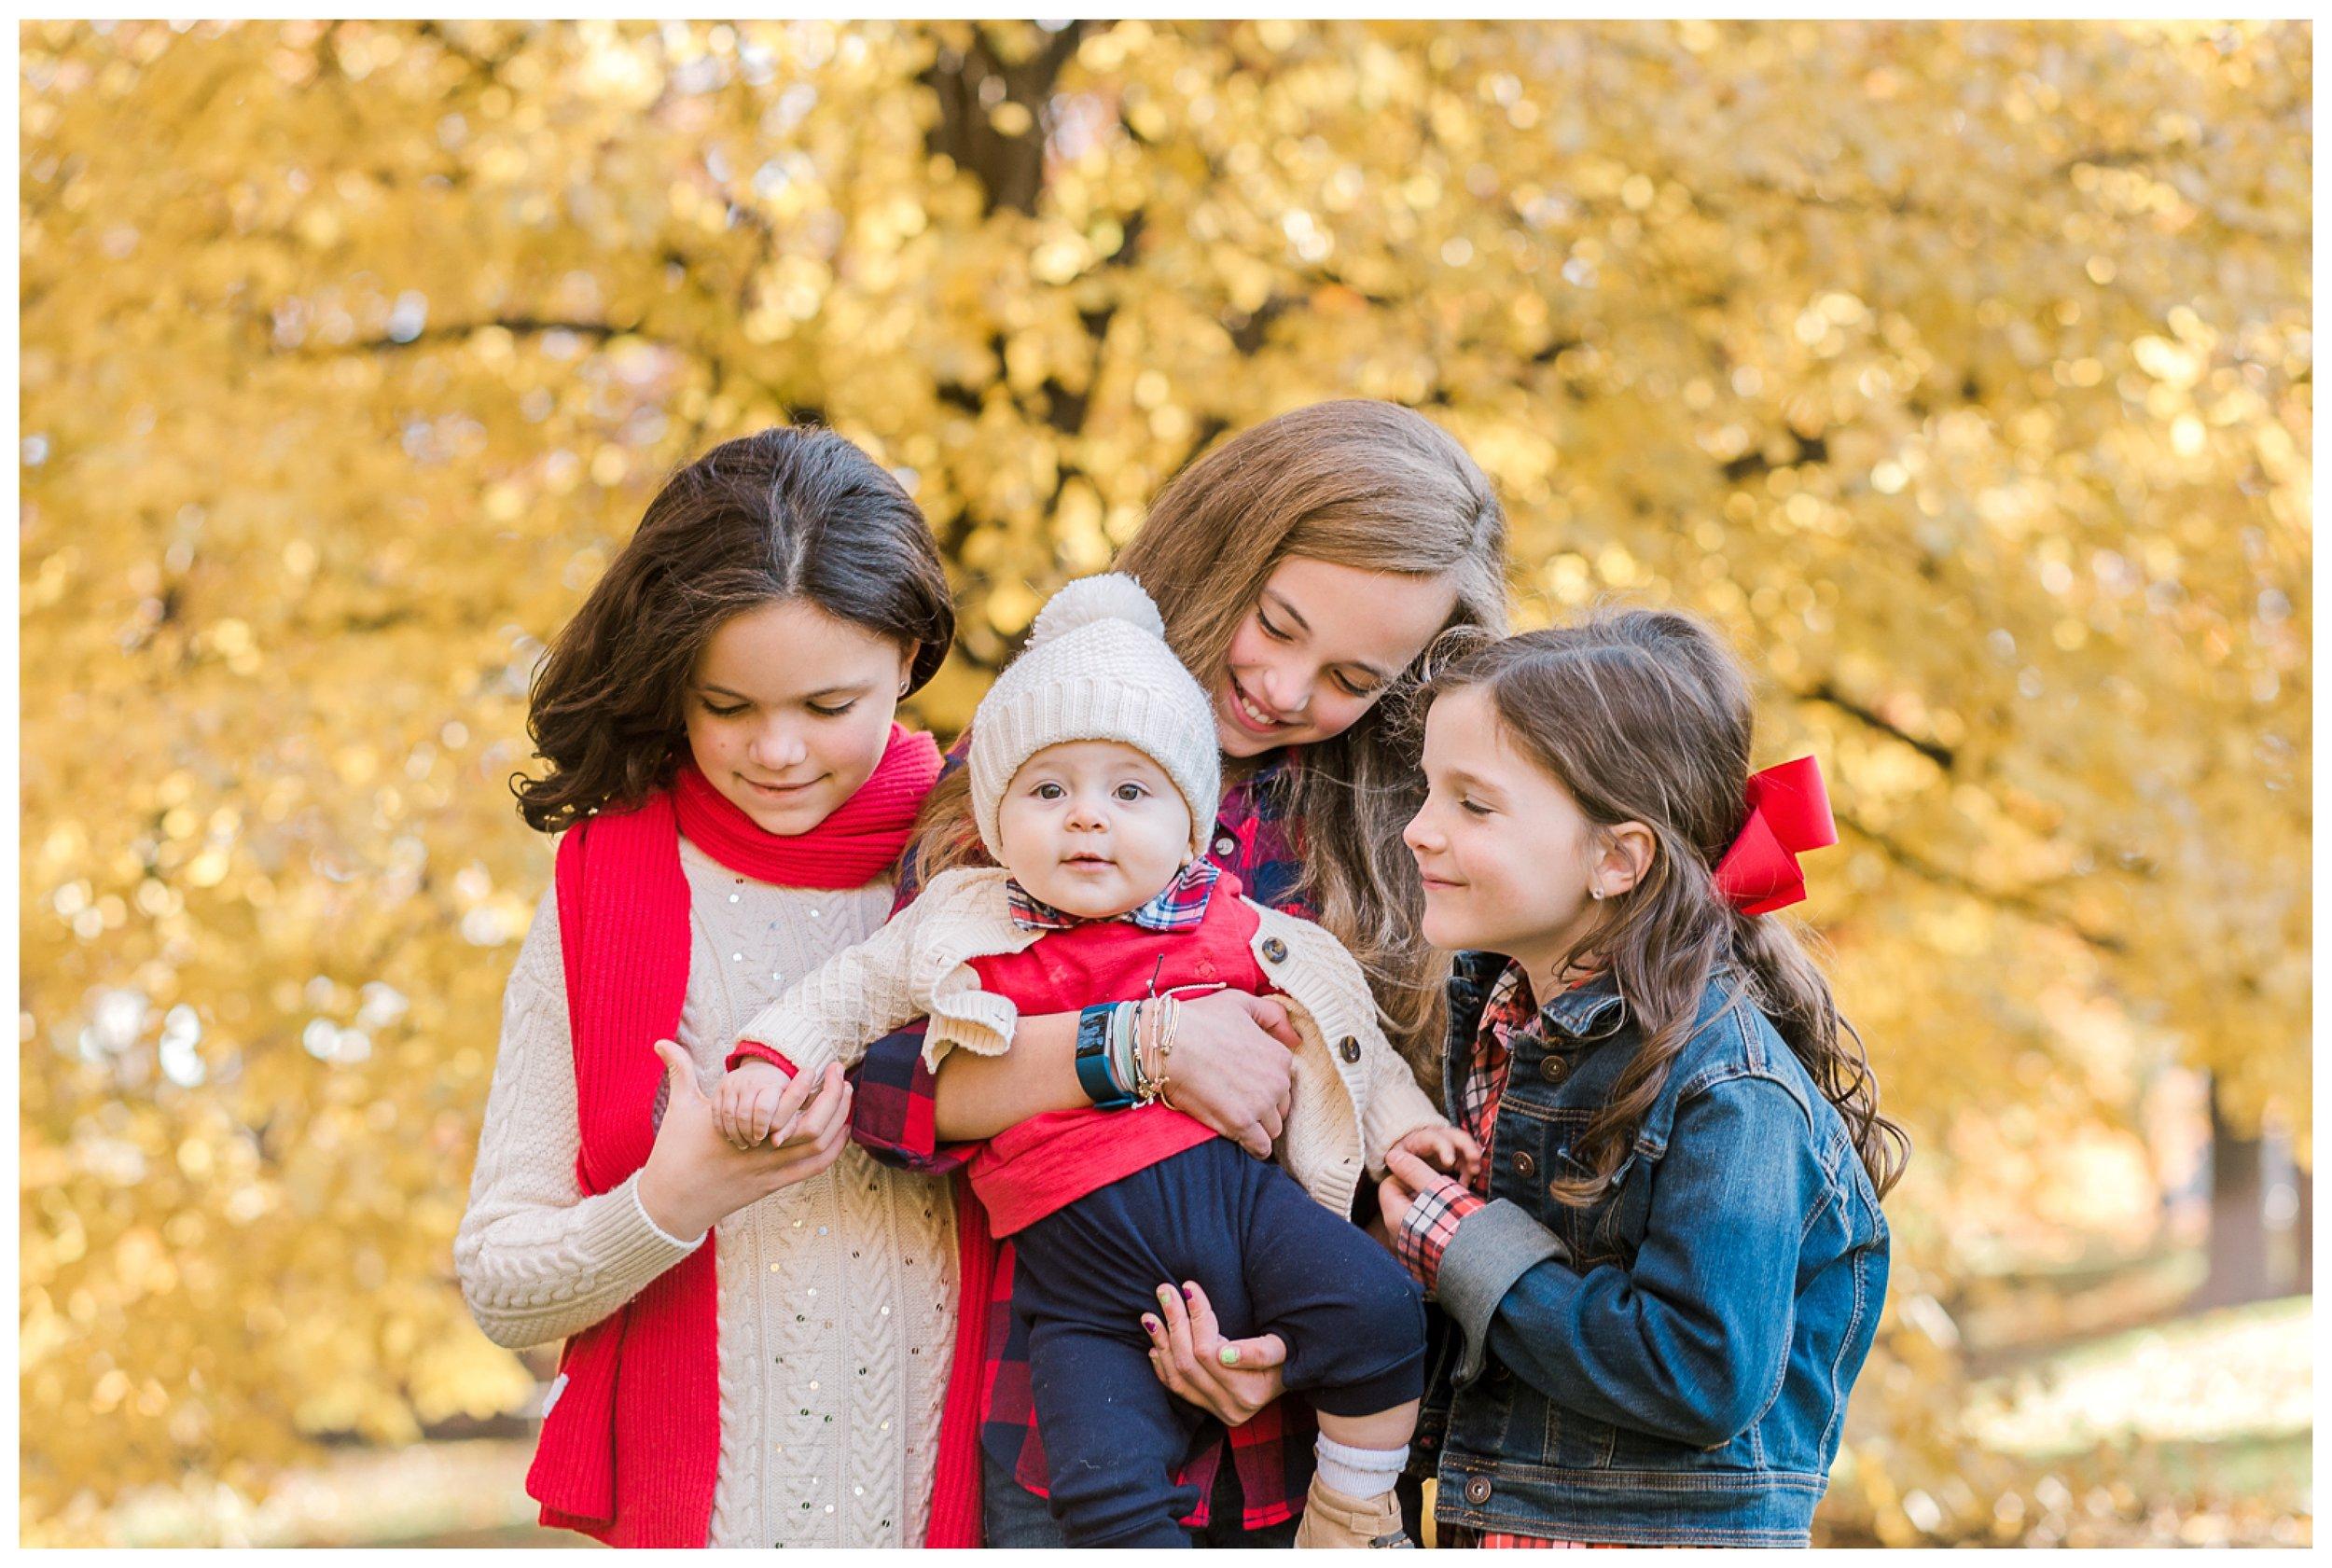 wellesley_fall_family_photographer_erica_pezente_photo (12).jpg